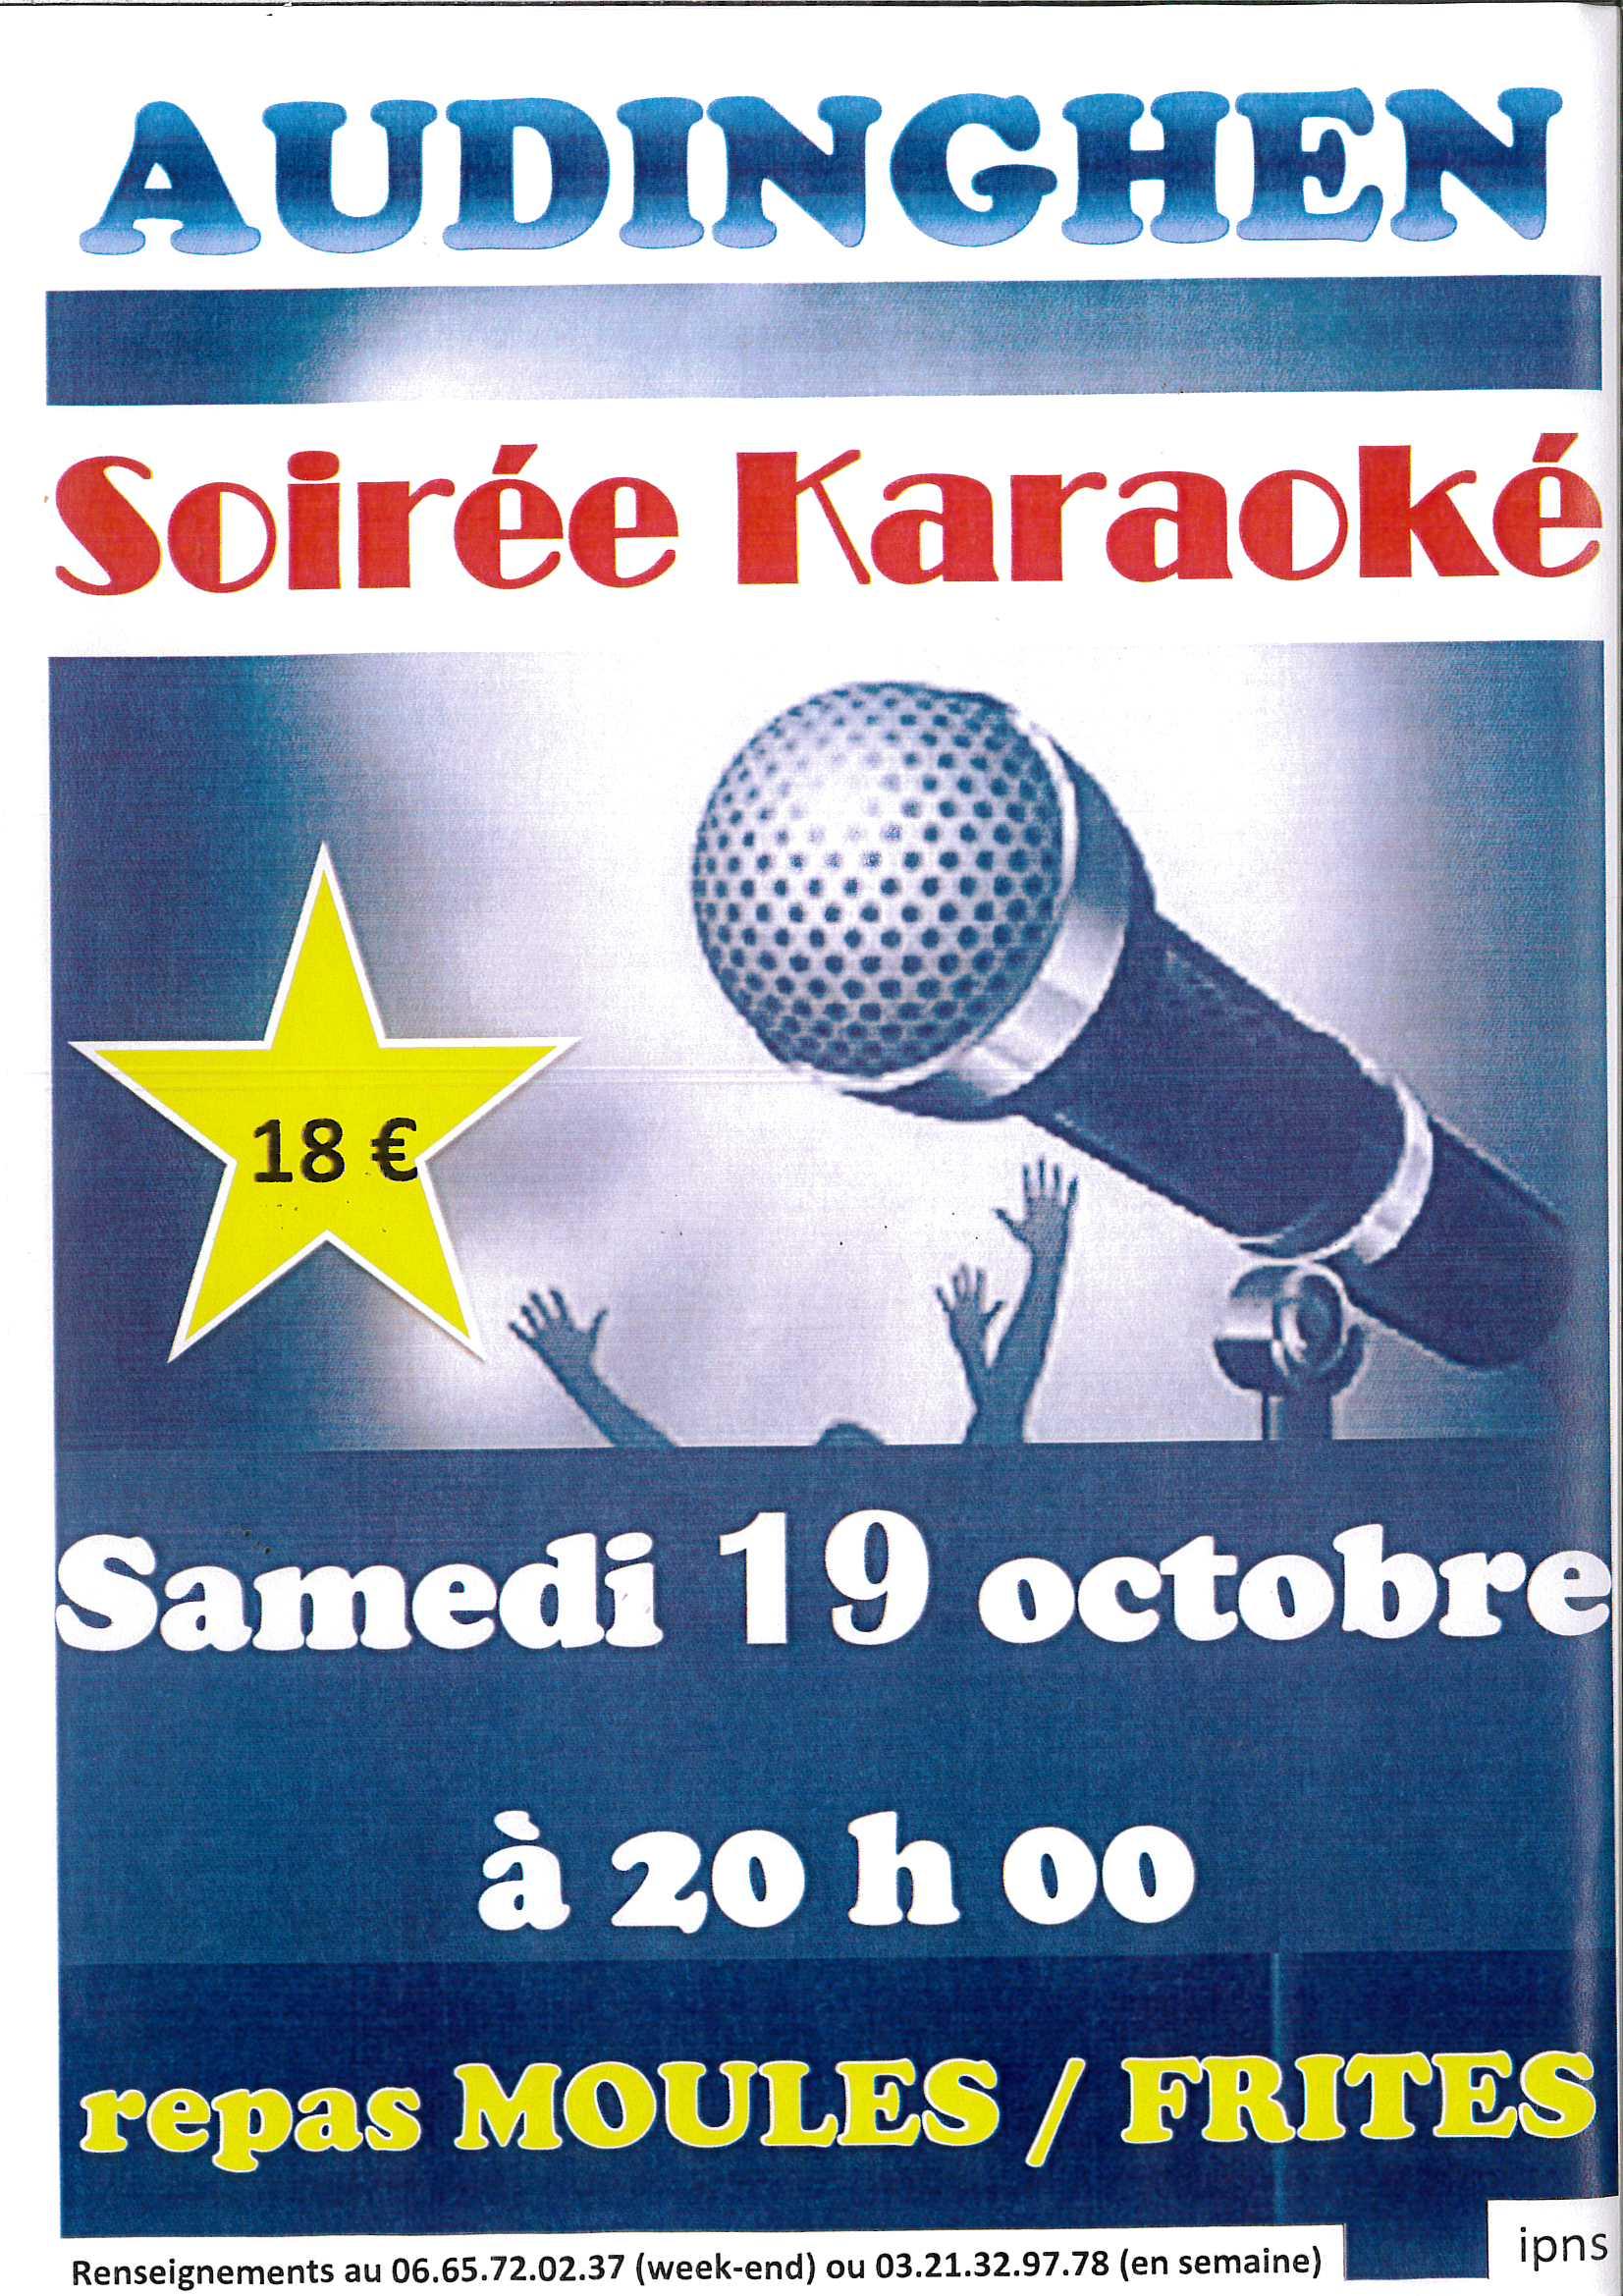 SOIREE KARAOKE @ Salle des fêtes AUDINGHEN